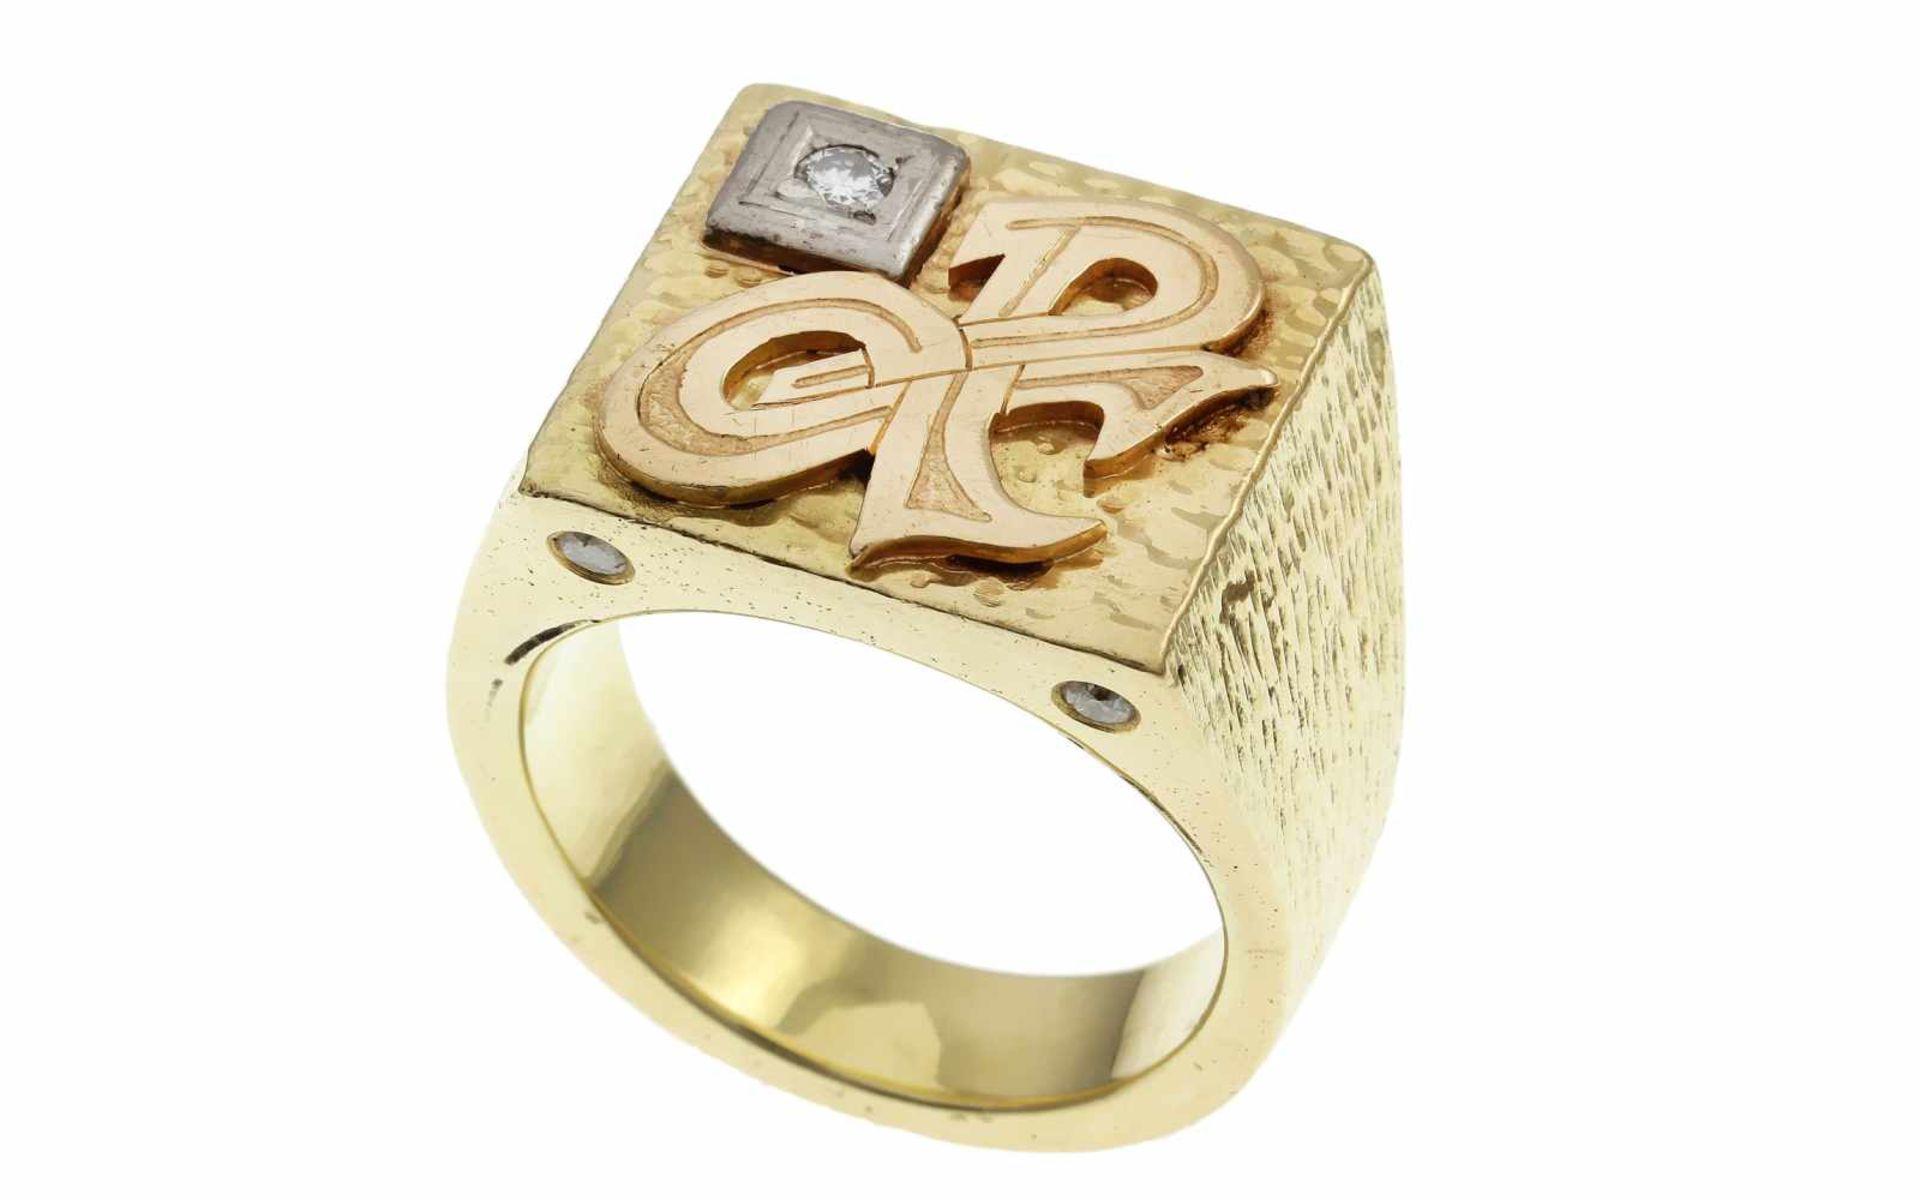 Los 57 - RingRing 585/- Gelbgold mit Diamanten, Ringgröße ca. 65, 5 Diamanten ca. 0,25 ct, G/si, 41,71g